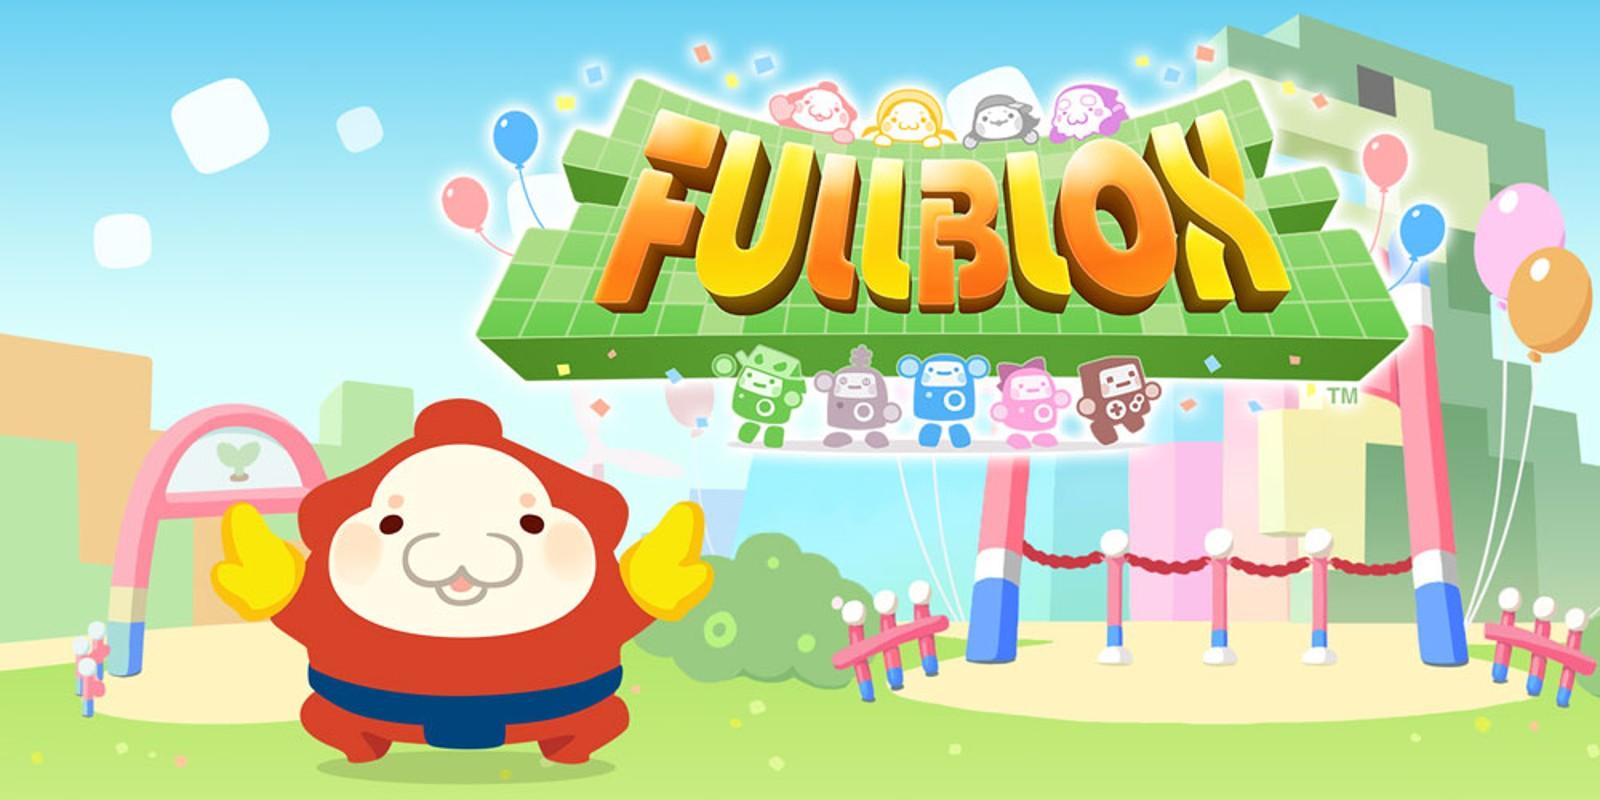 Fullblox Nintendo 3ds Download Software Games Eshop Gift Card Us 50 Digital Code